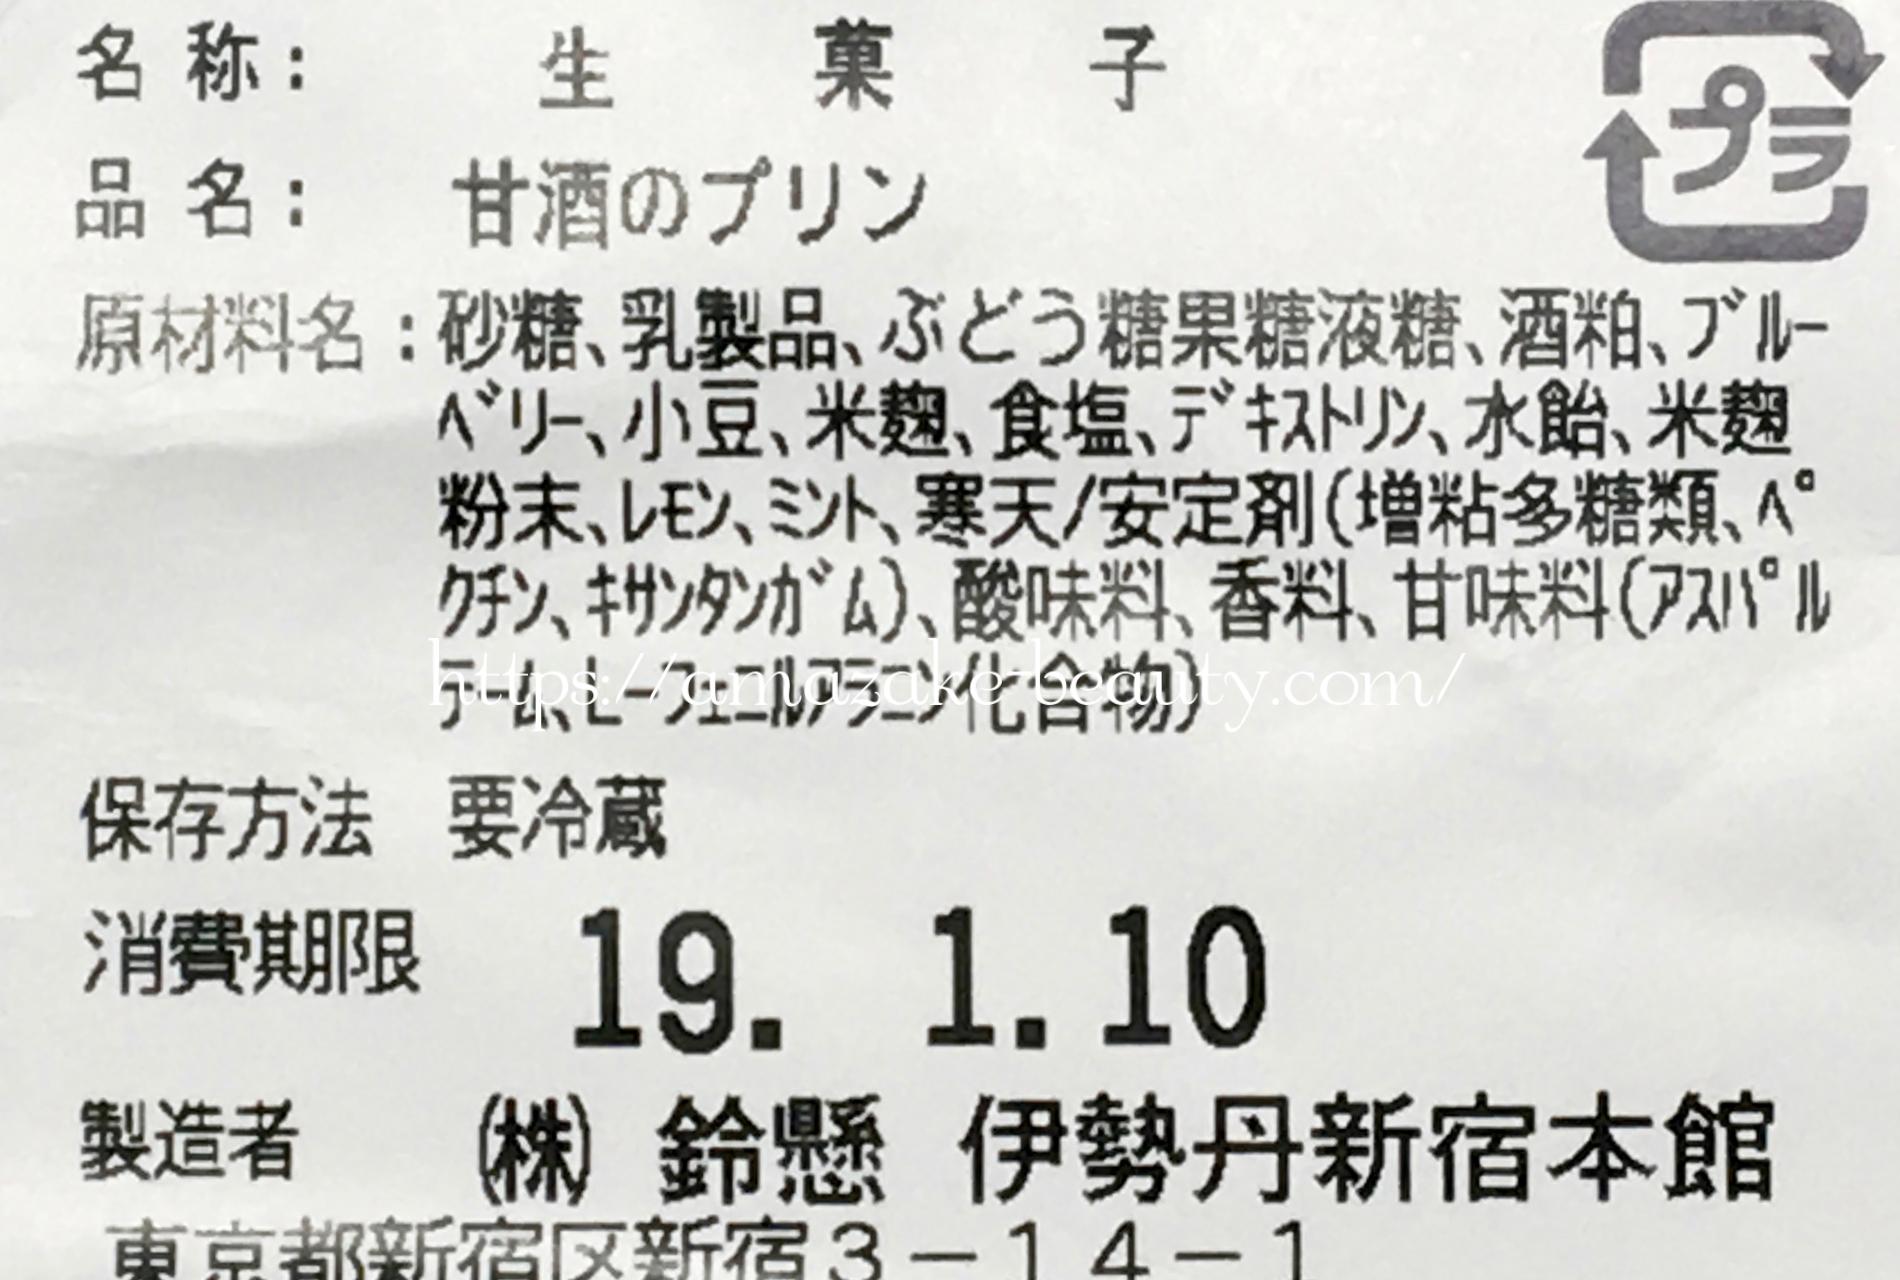 [amazake sweets]suzukake[amazake no purin](product description)